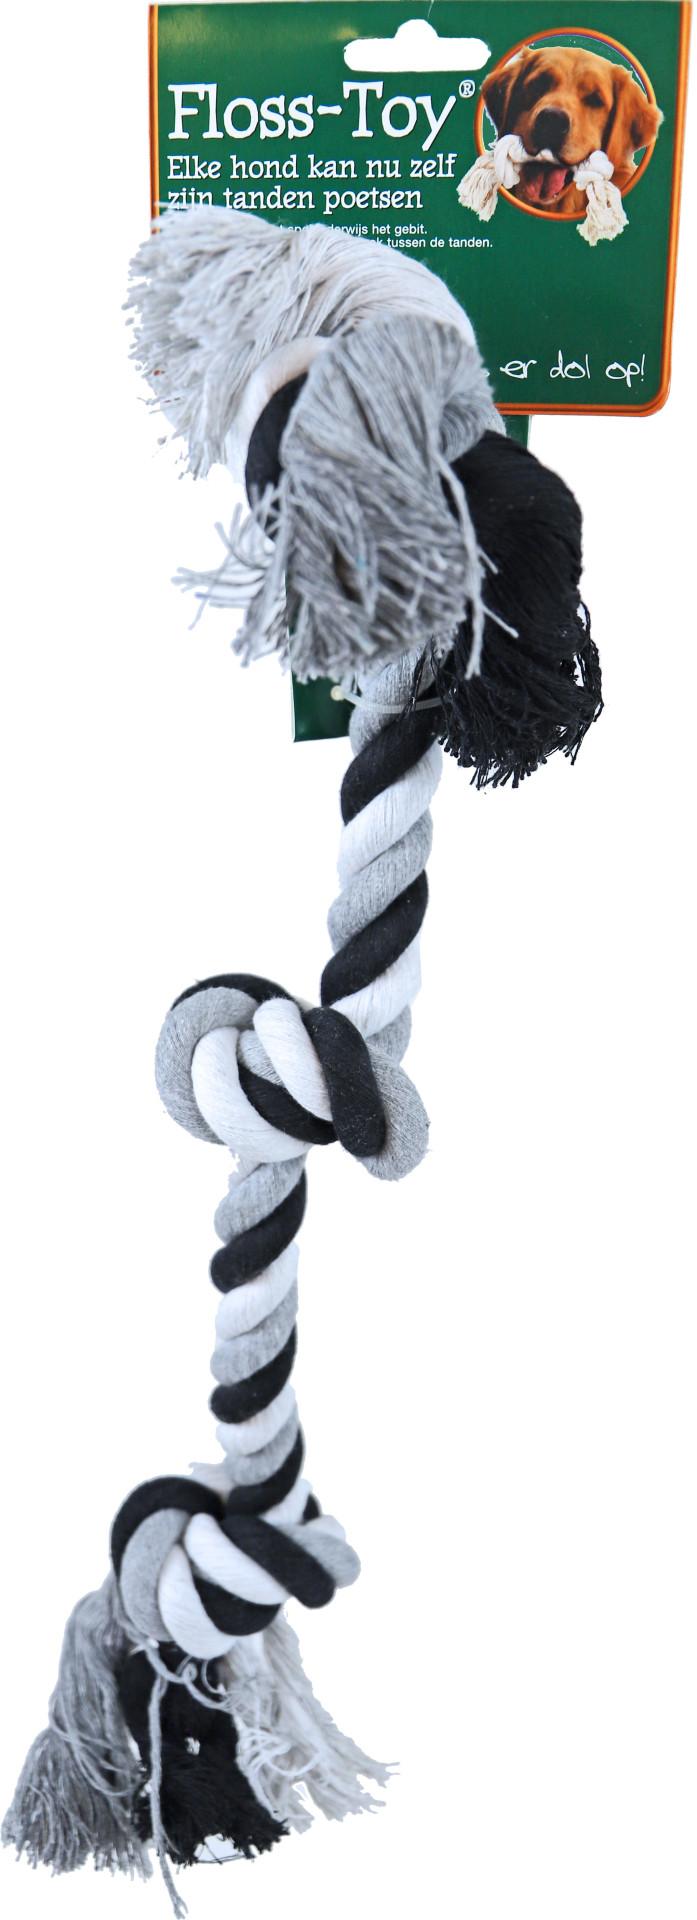 Floss-Toy 3-knoop zwart/wit